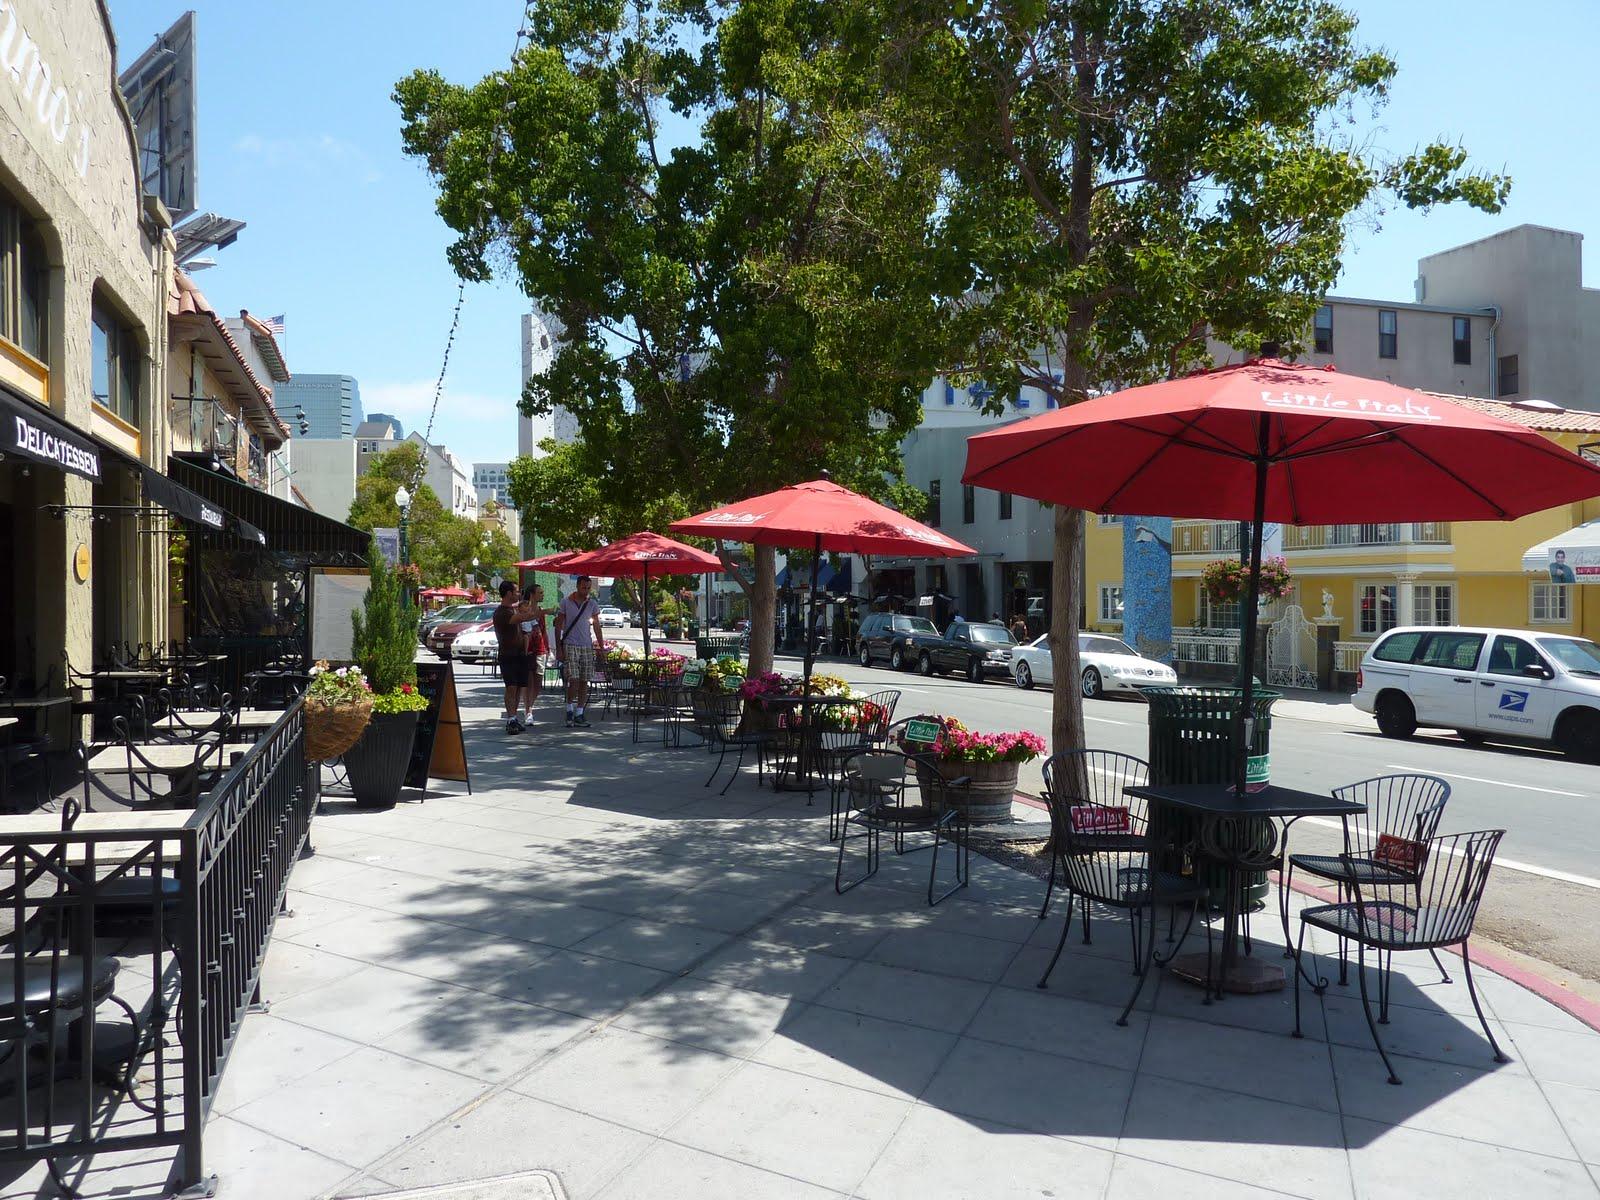 Big Italian Restaurants Near Me: Trace My Footsteps: San Diego